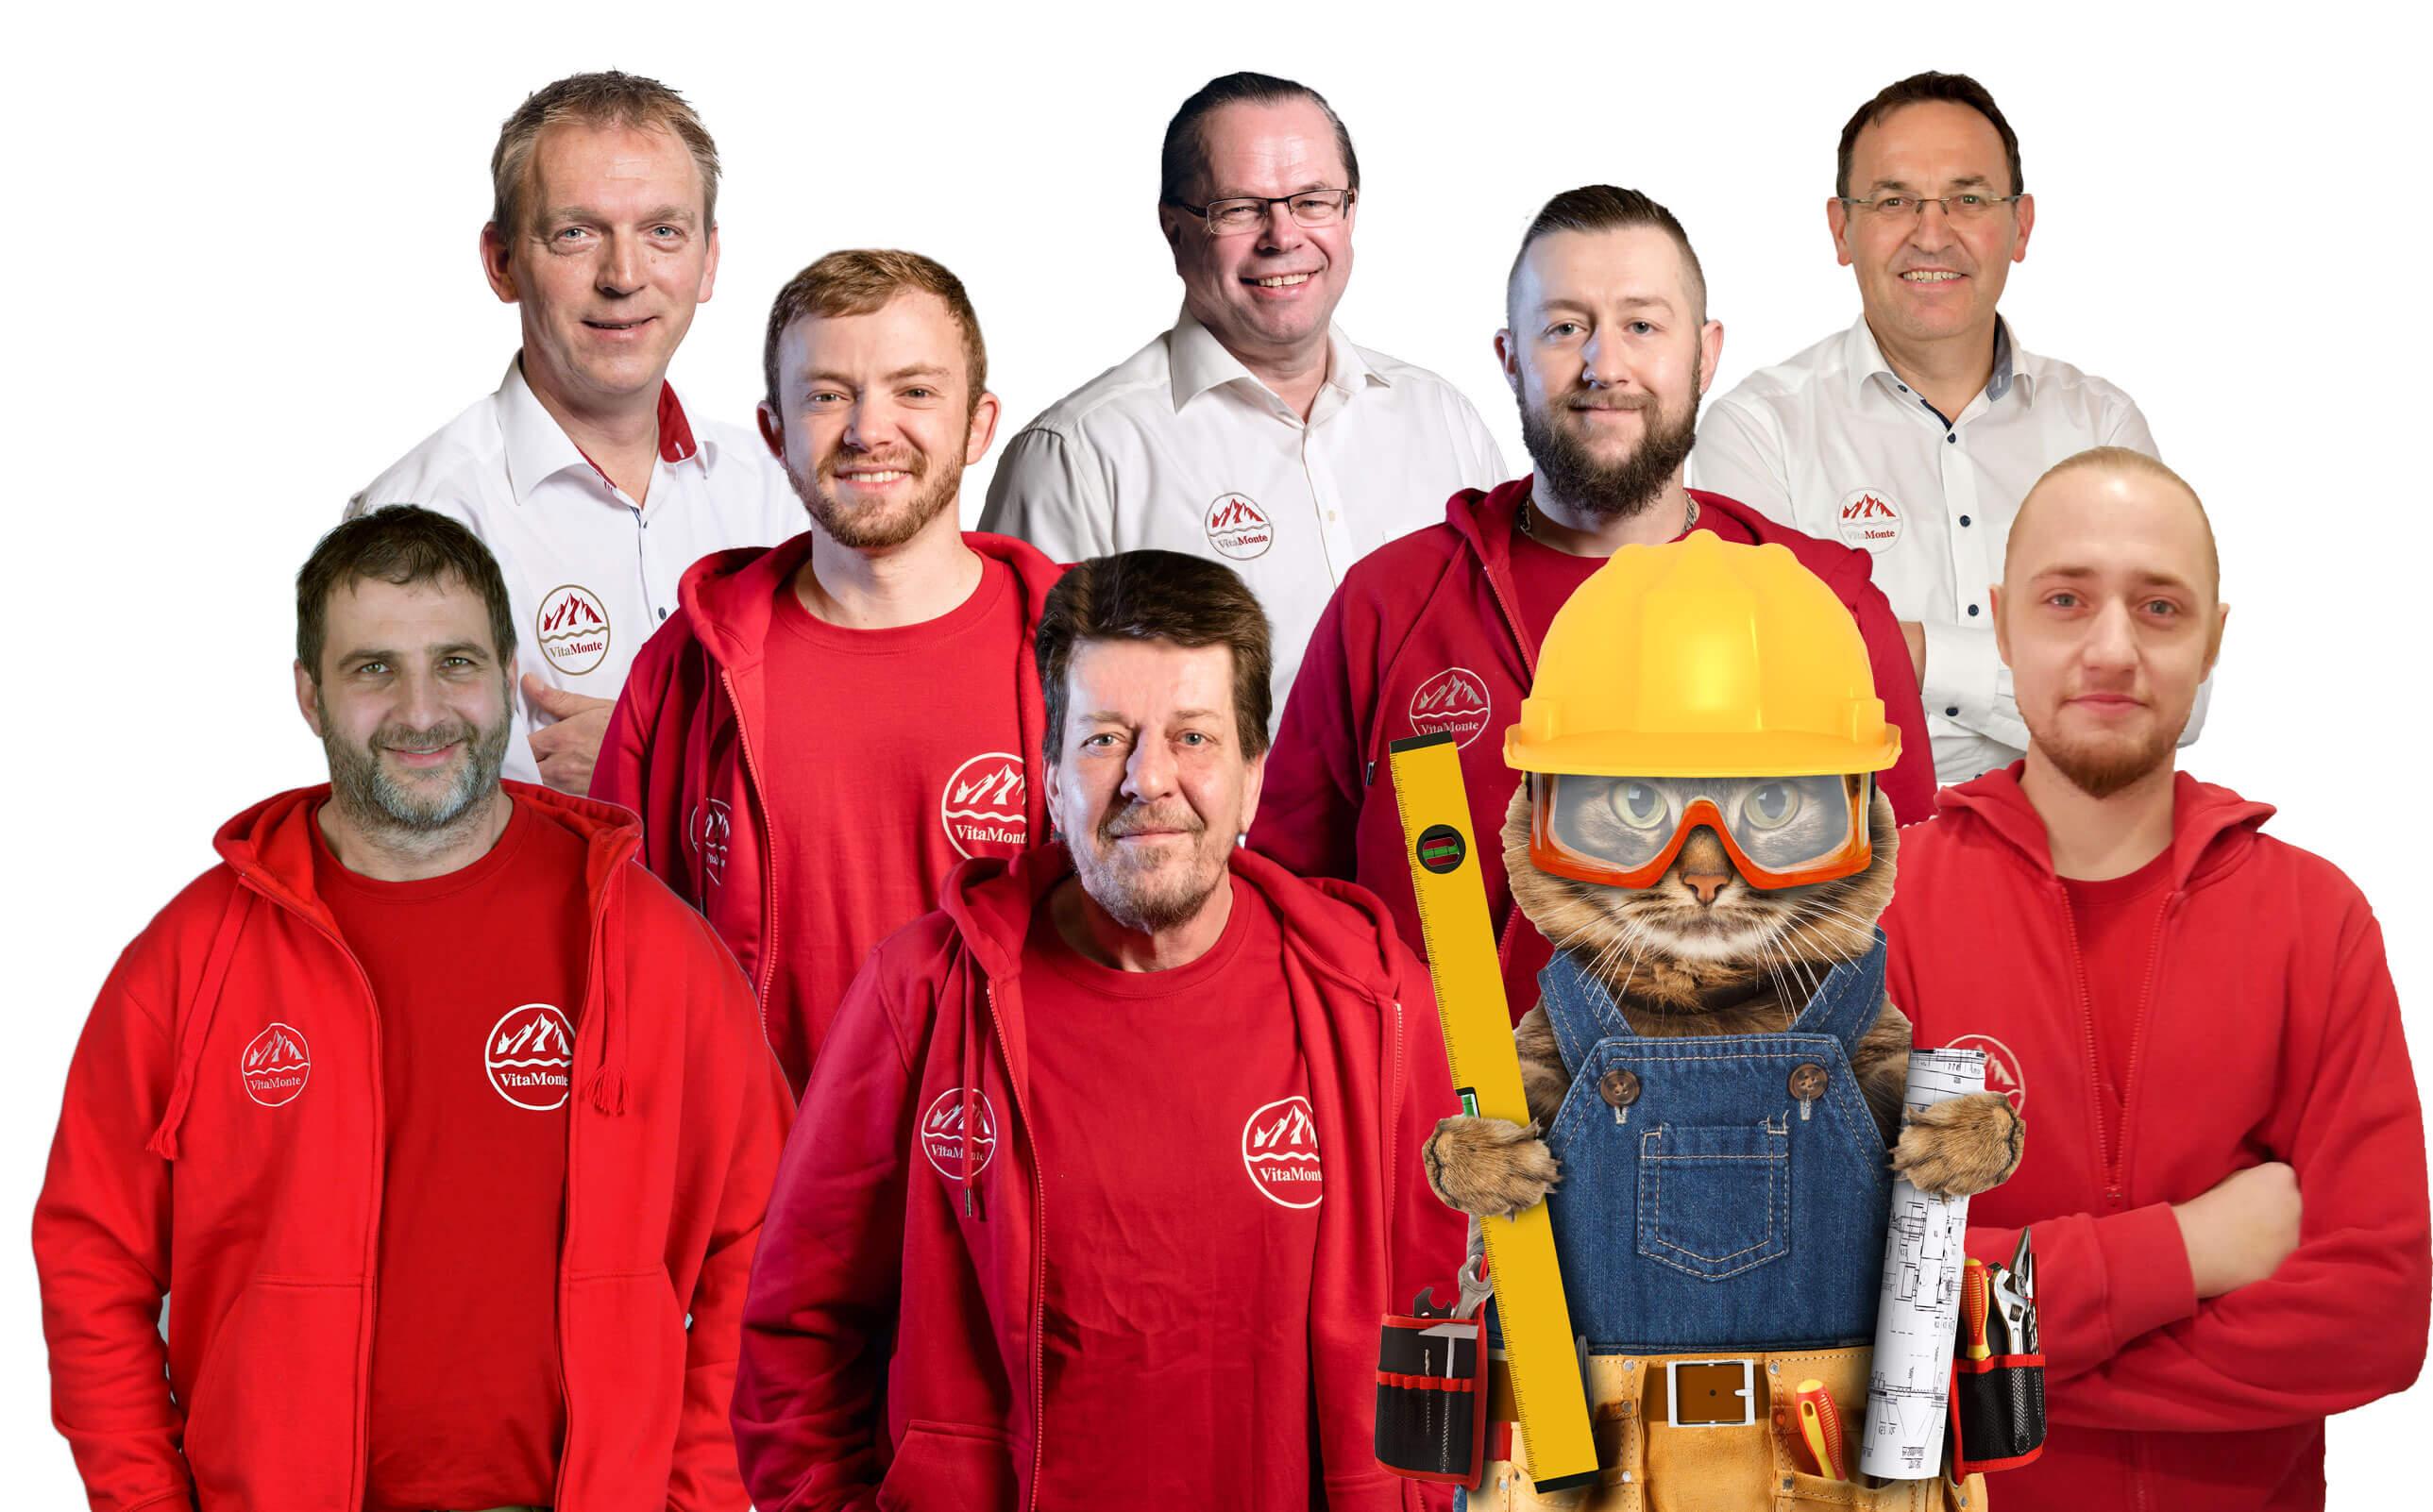 Team VitaMonte GmbH